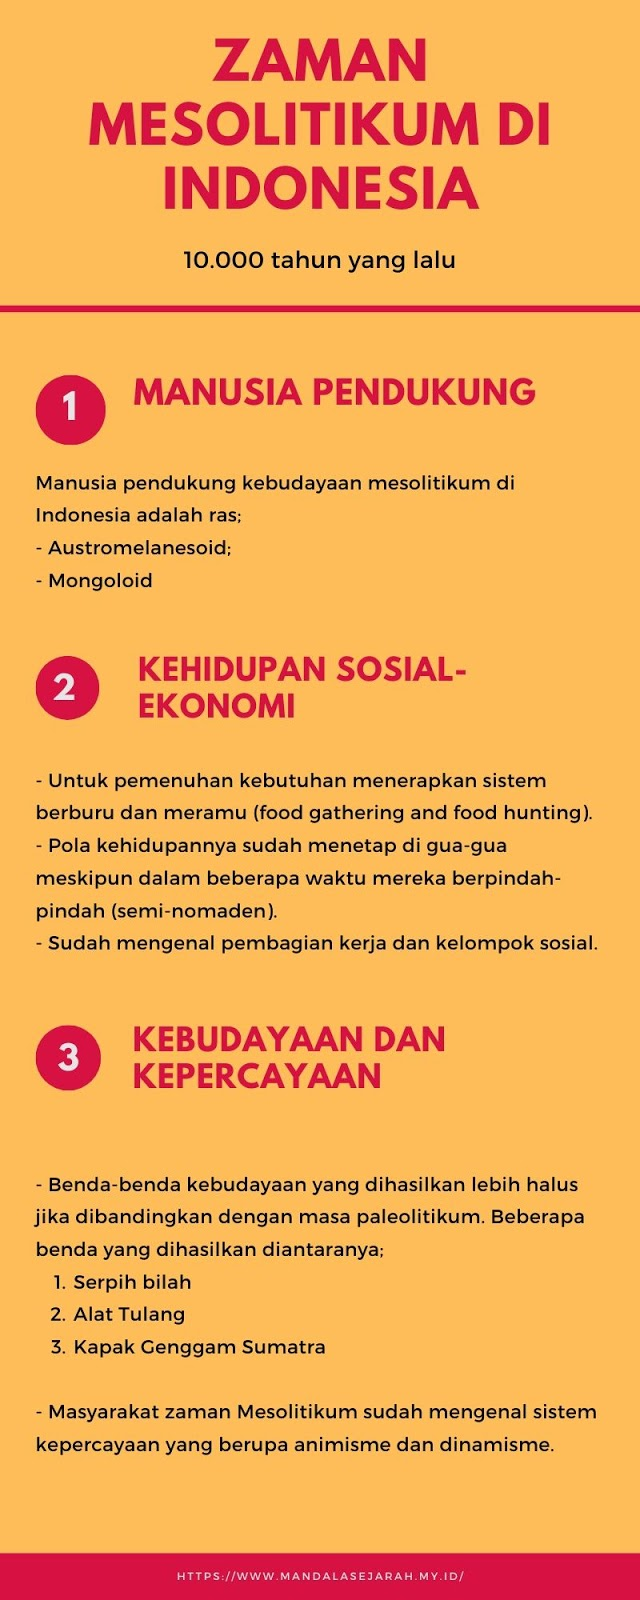 Zaman Mesolitikum di Indonesia